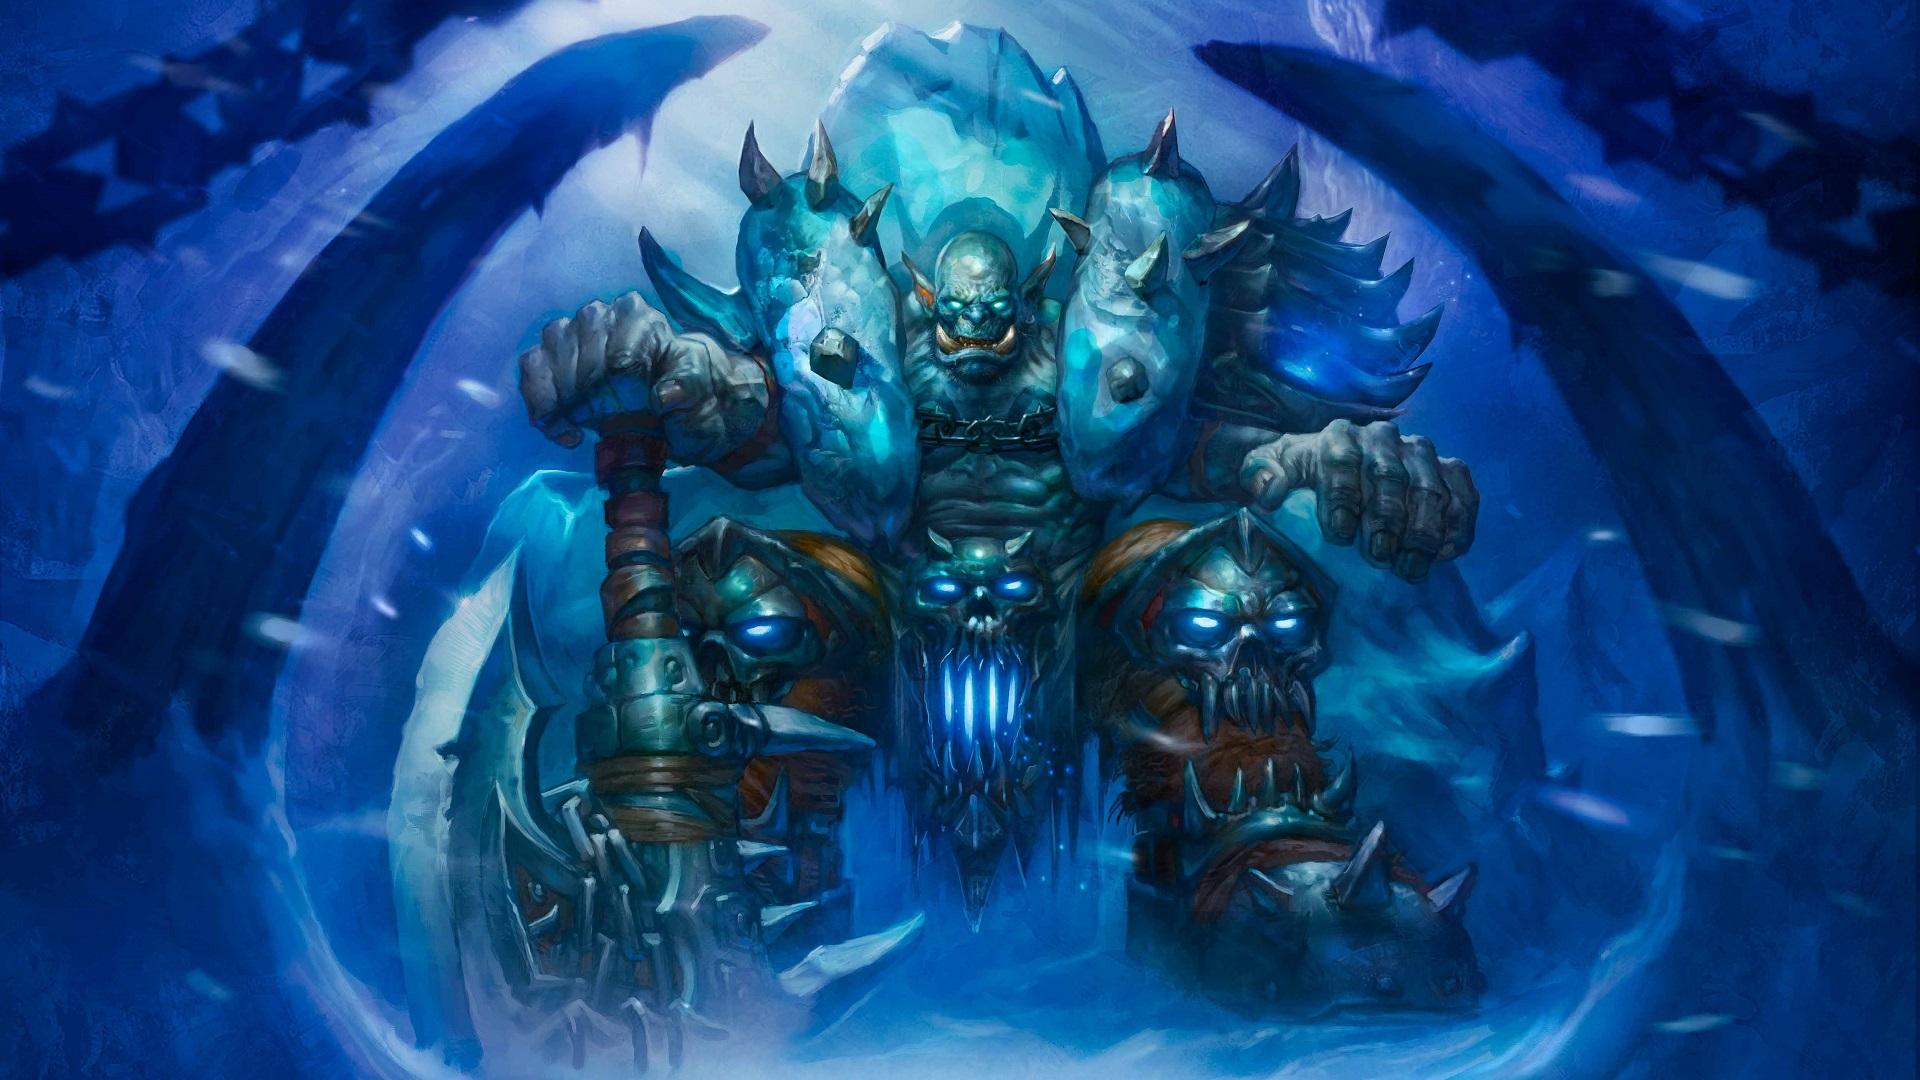 General 1920x1080 Hearthstone: Heroes of Warcraft Hearthstone Warcraft cards artwork Knights of the frozen throne Death Knight Garrosh Hellscream video games